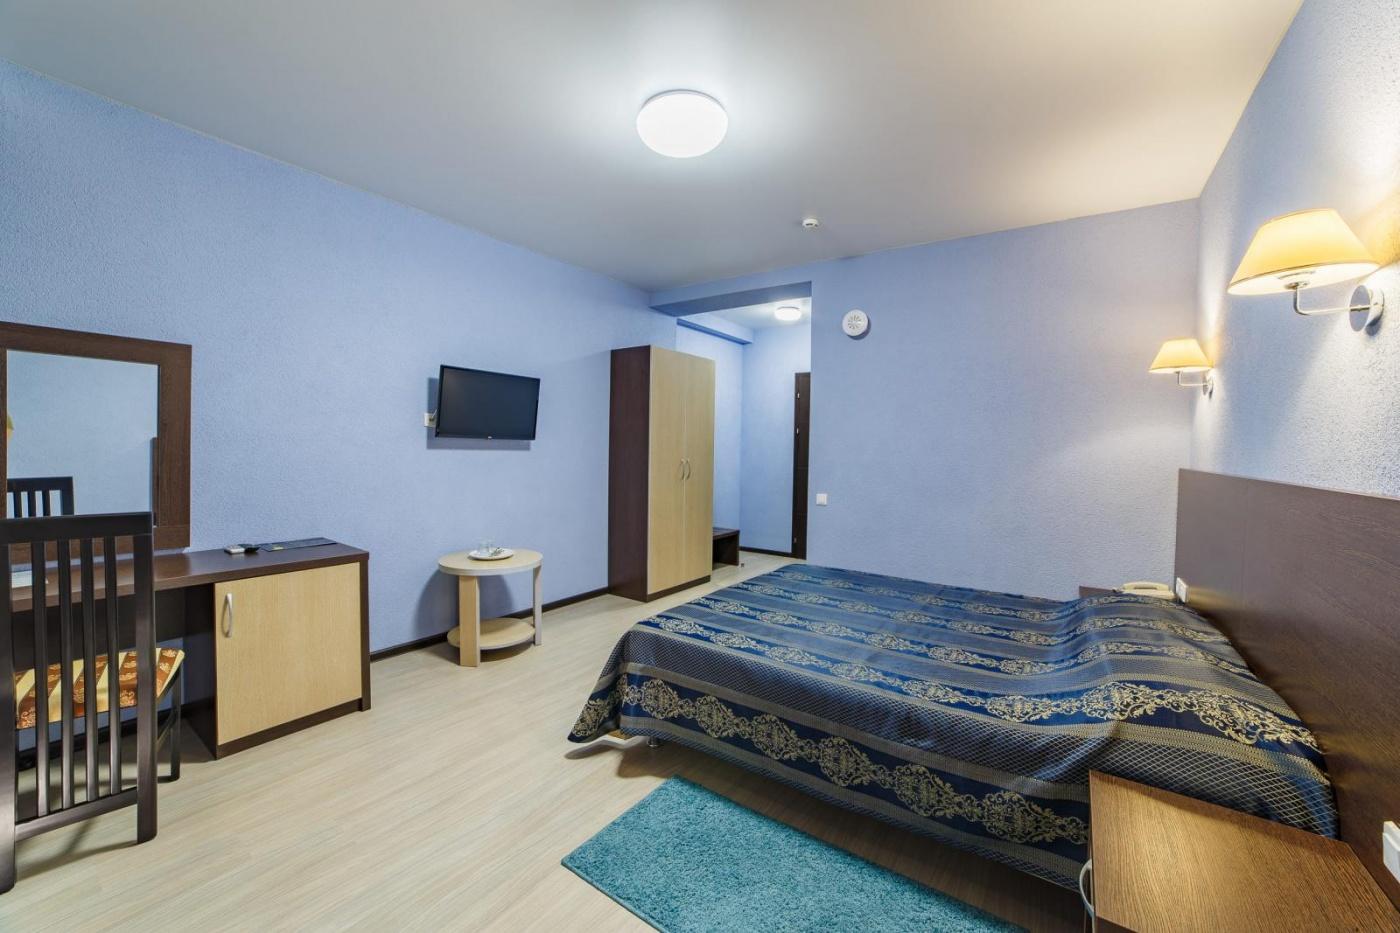 Отель «Relax» Краснодарский край Standard без балкона, фото 2